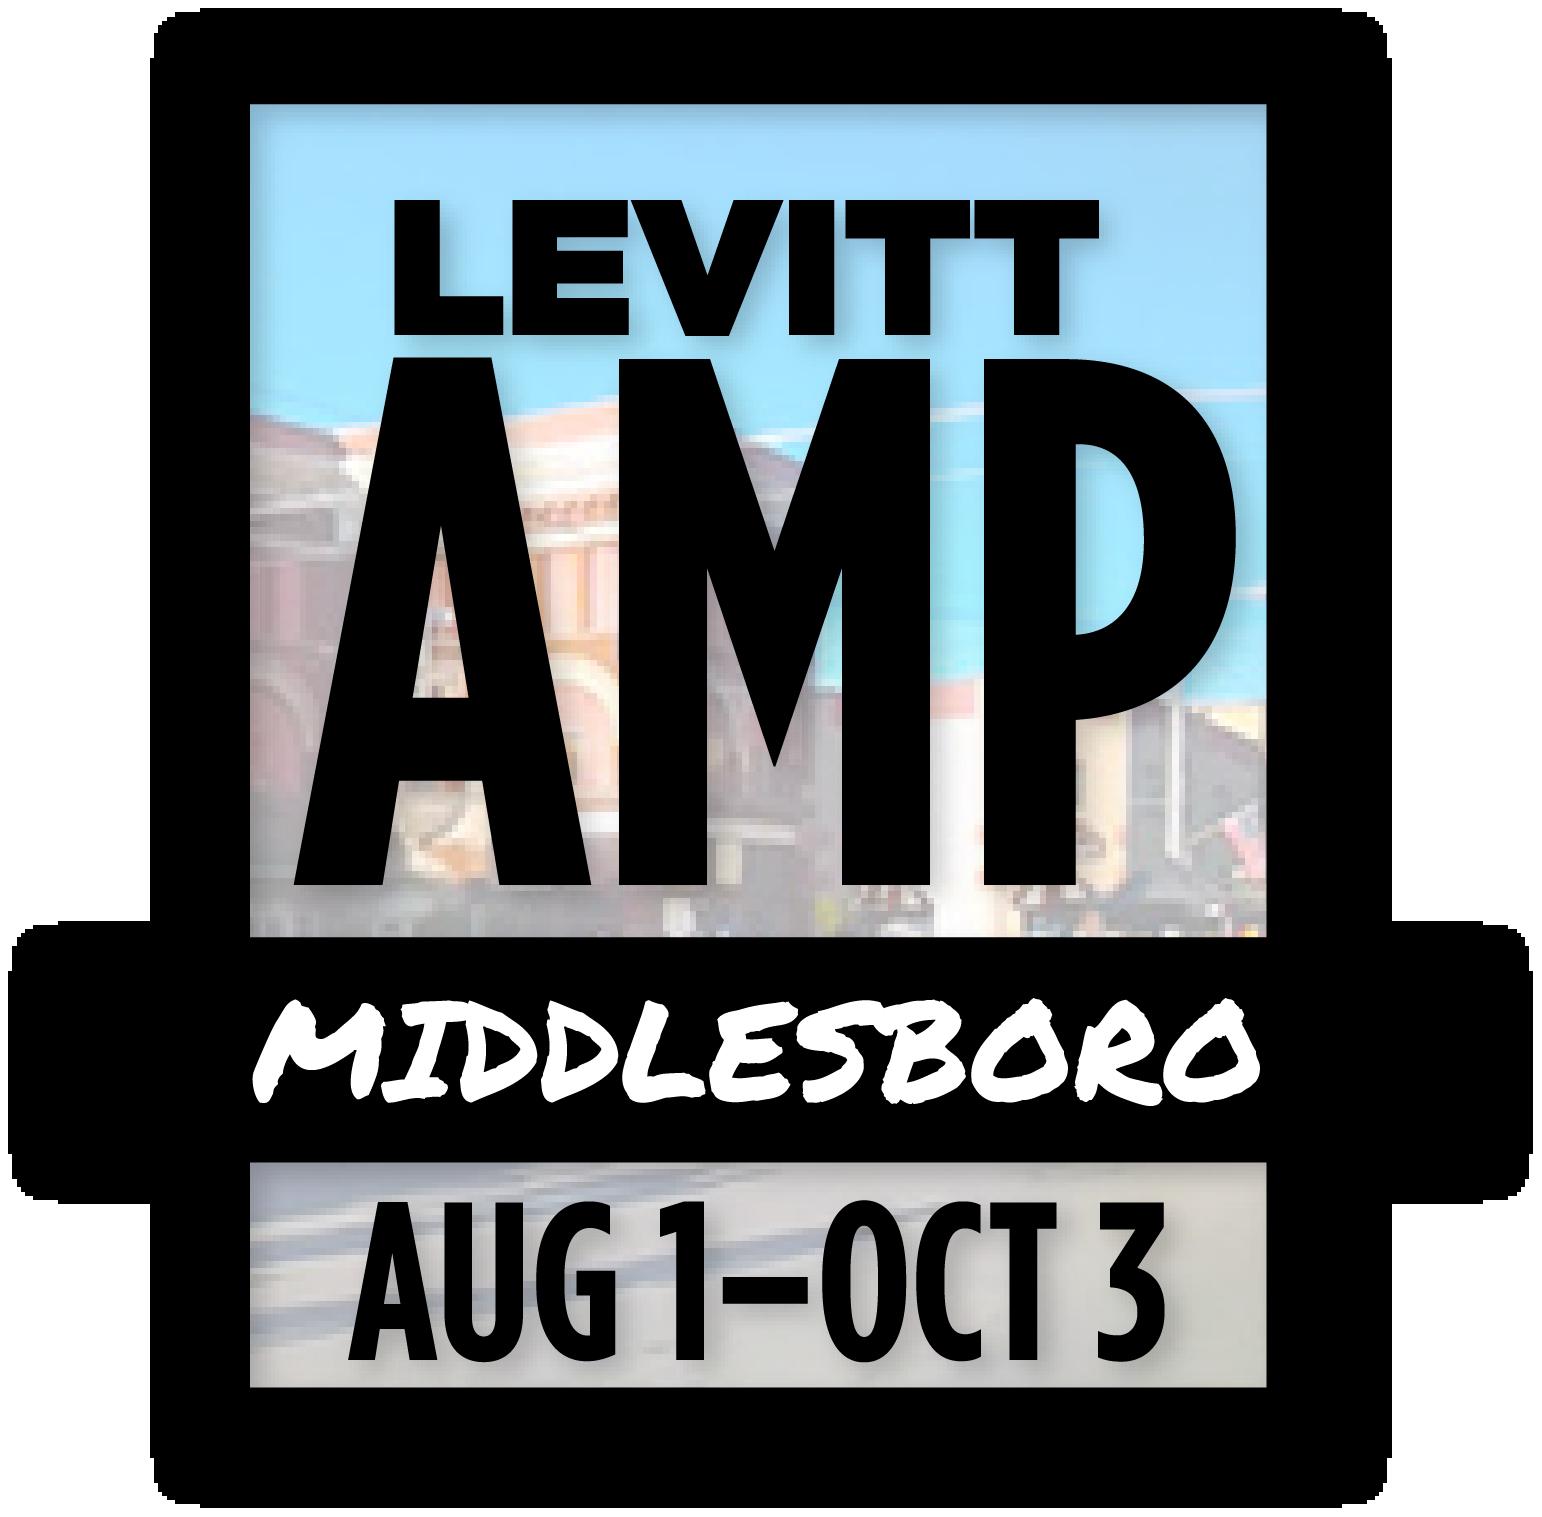 Middlesboro_Levitt_AMP_Graphic.png